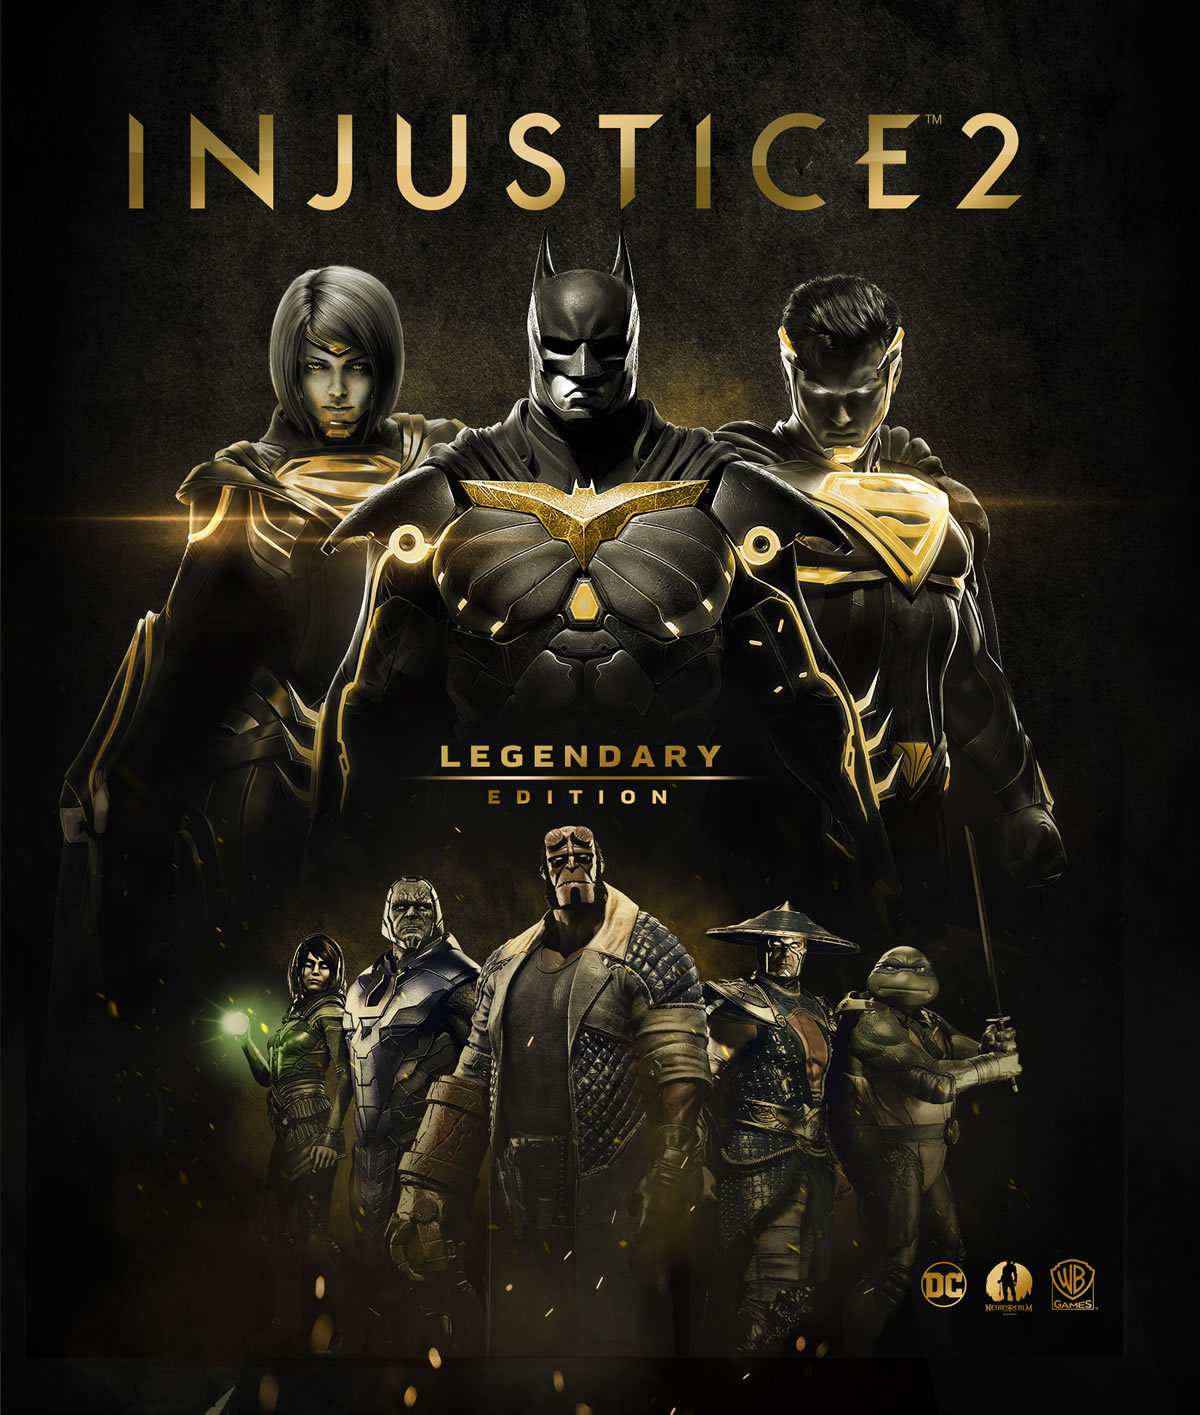 Injustice 2: NetherRealm Studios annuncia oggi la Legendary Edition